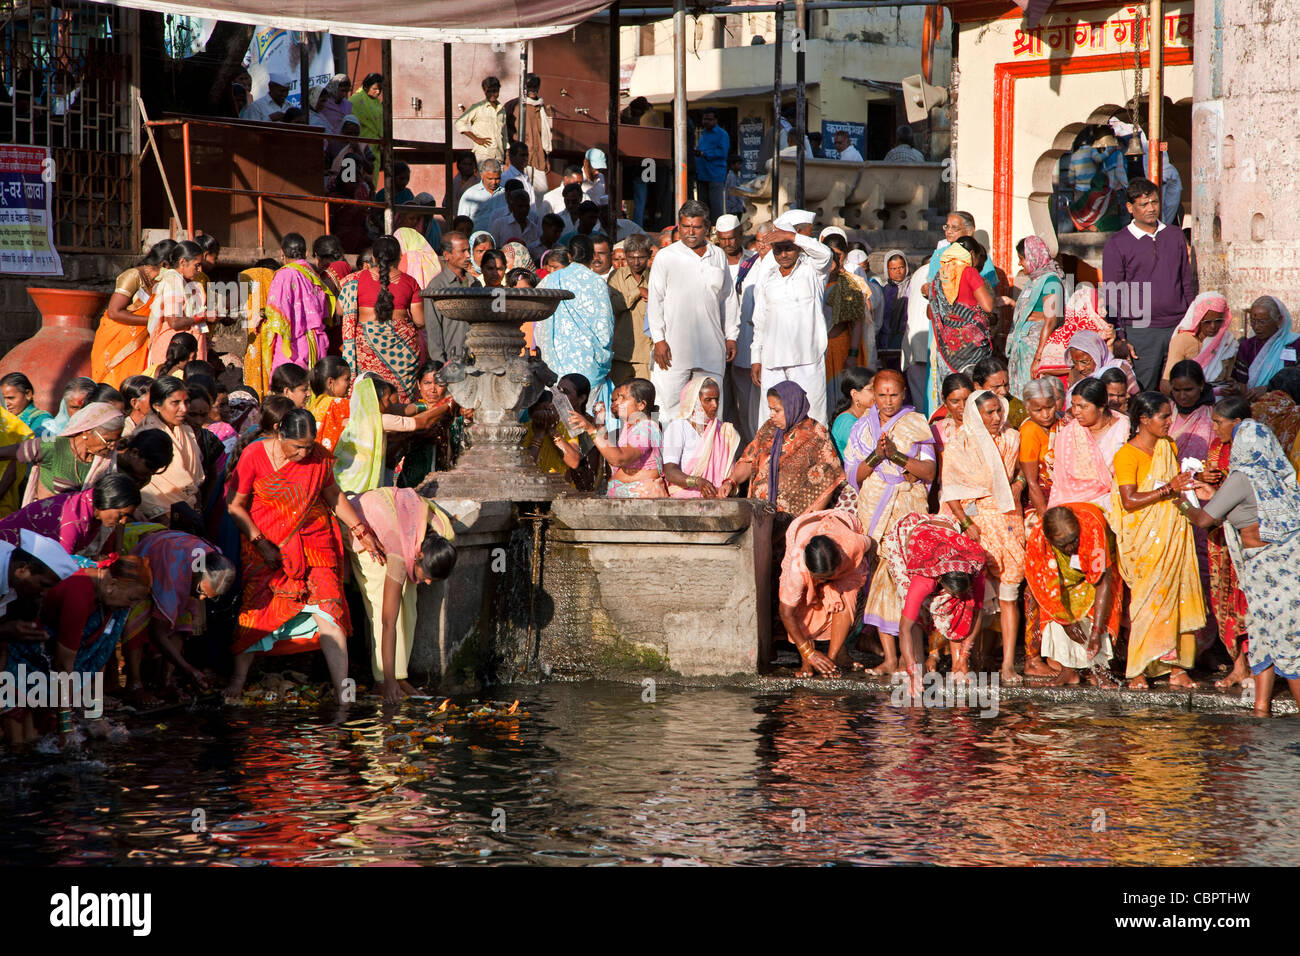 Women taking the ritual bath in the sacred waters of the Godavari river. Ram Kund. Nasik. India Stock Photo